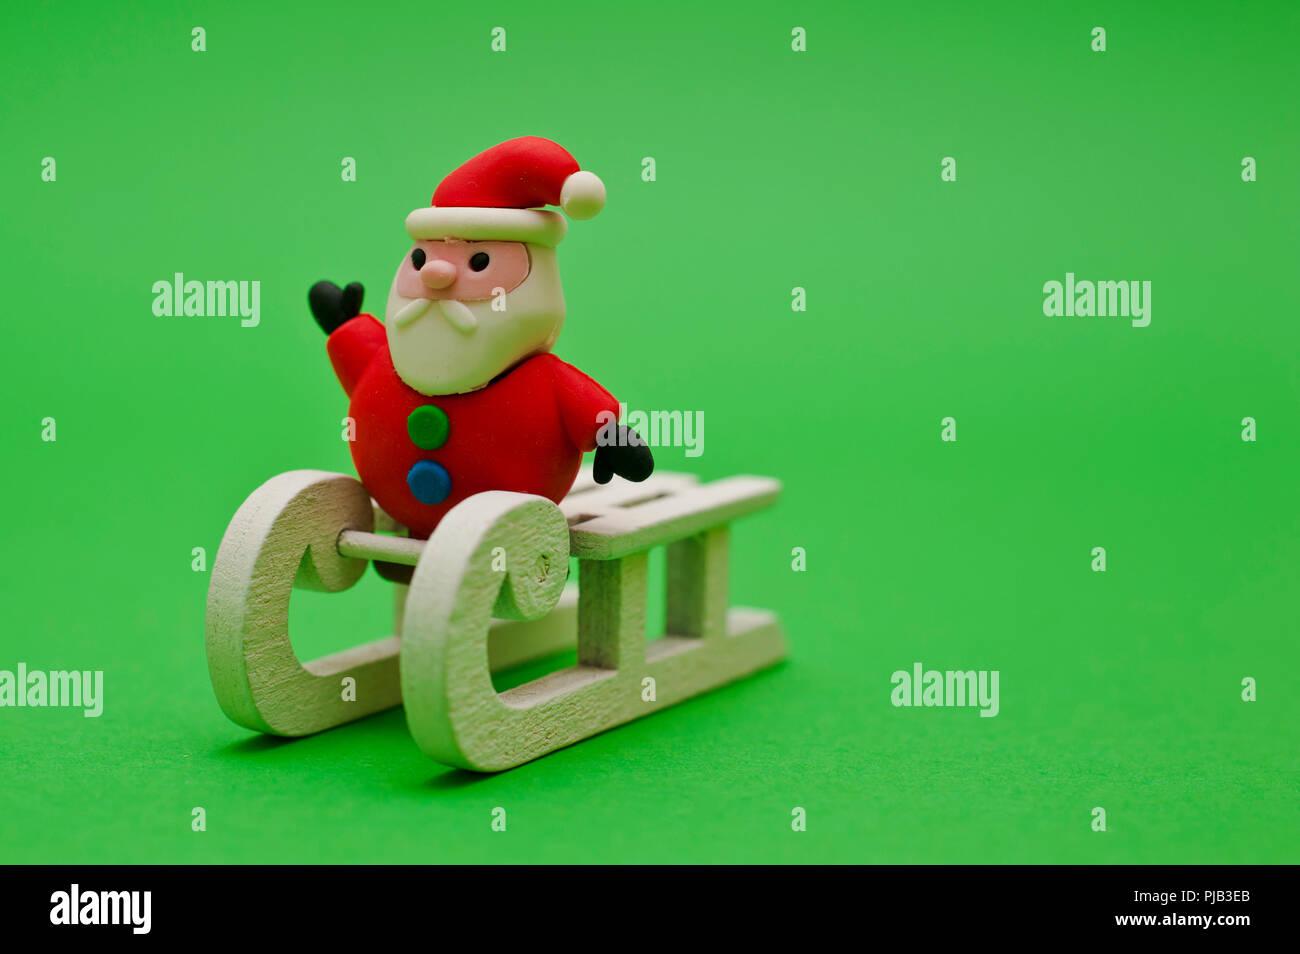 Santa Claus miniature figurine on a sledge - Stock Image